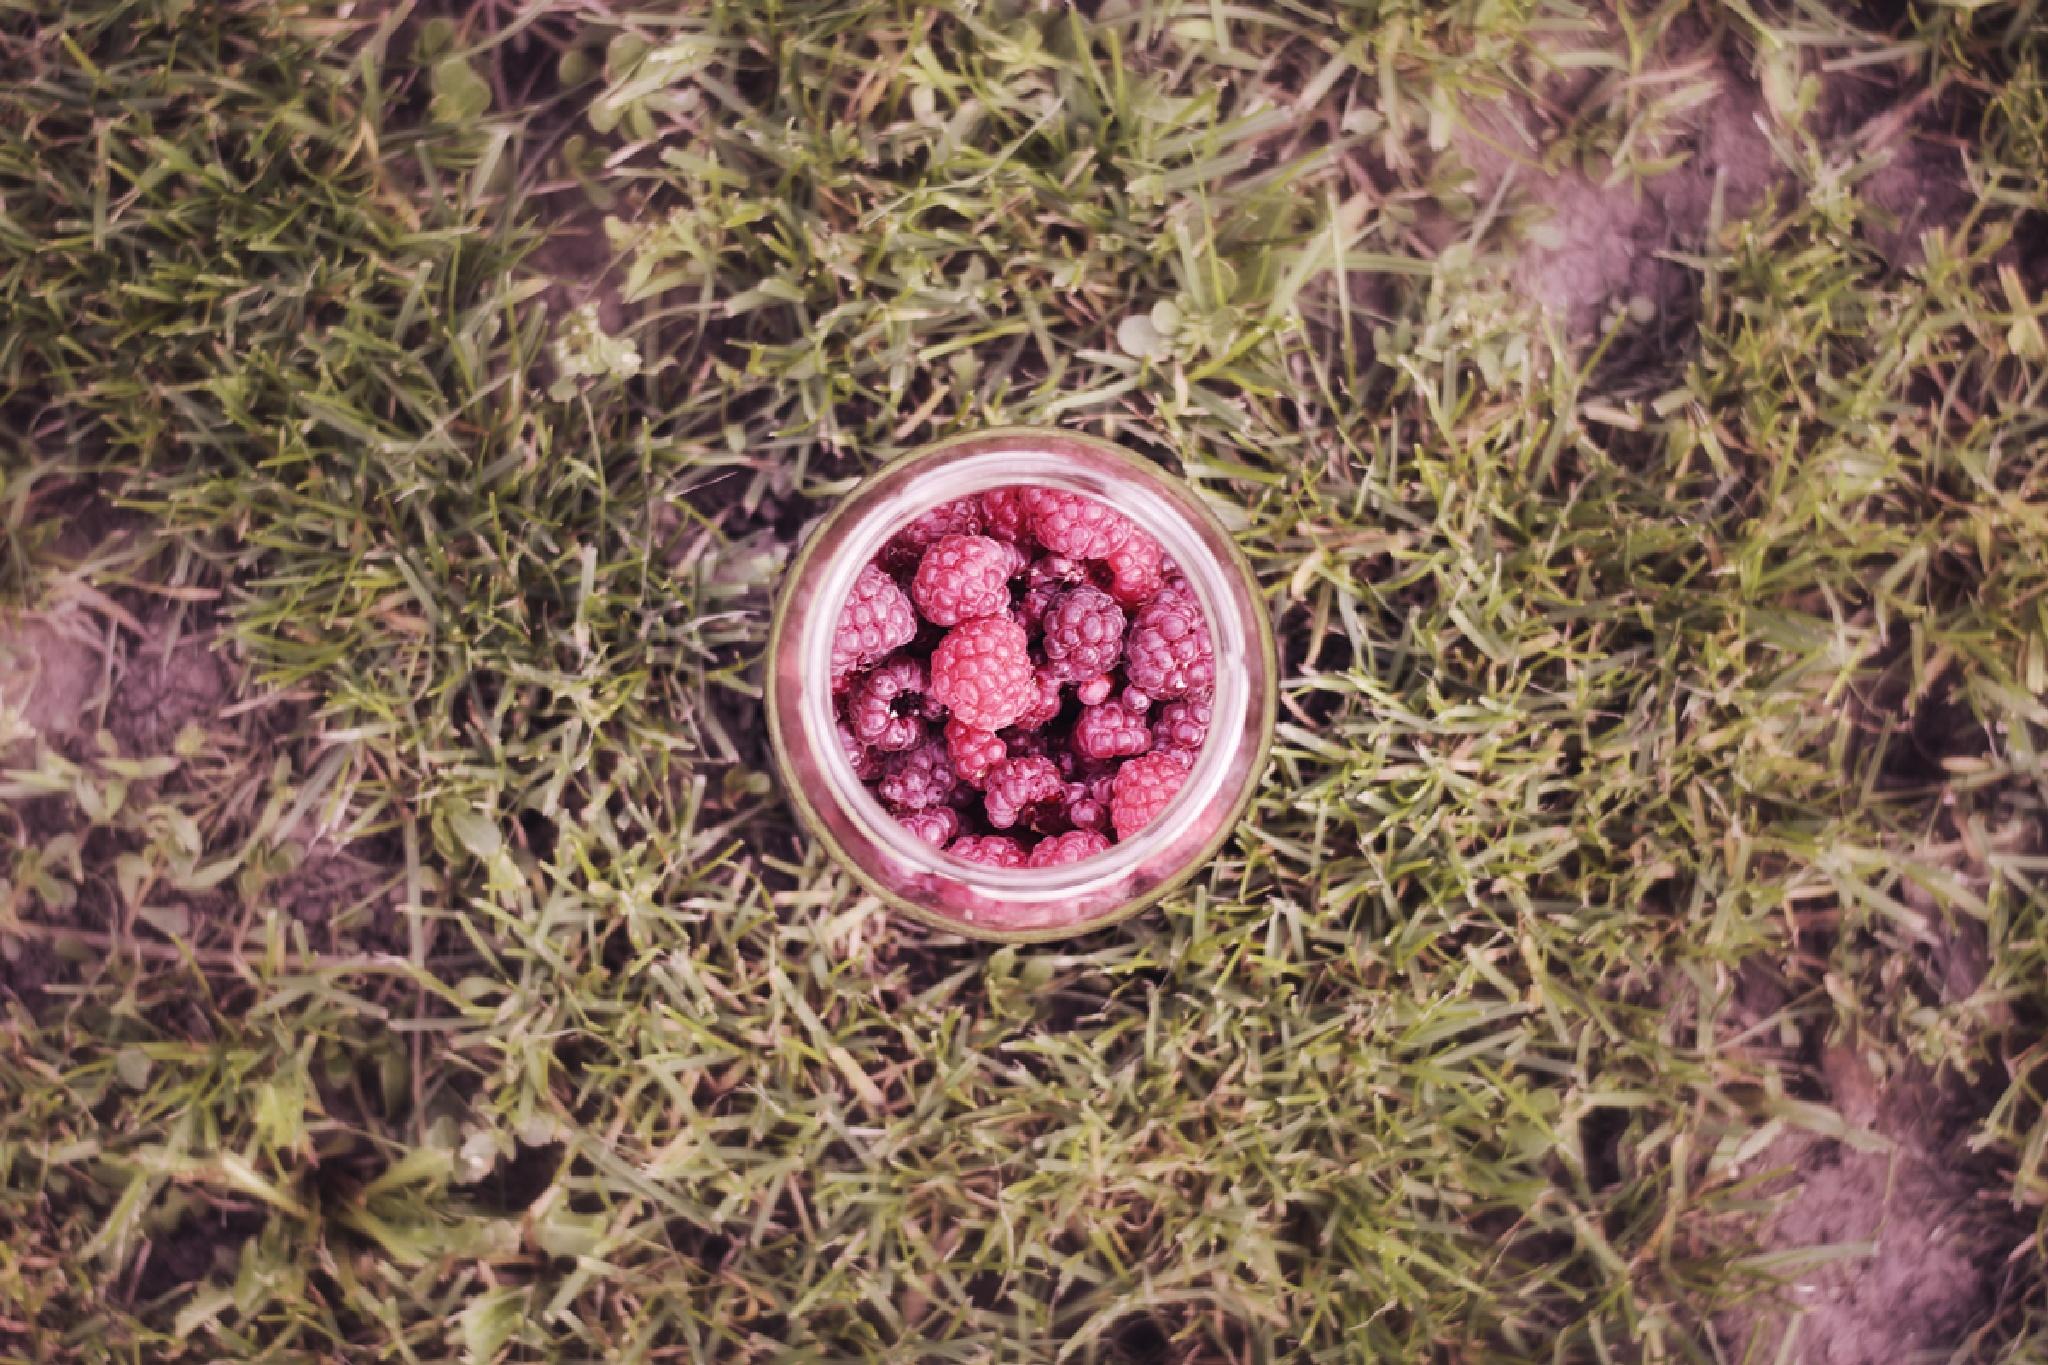 Raspberries by Janos Szentgyorgyi